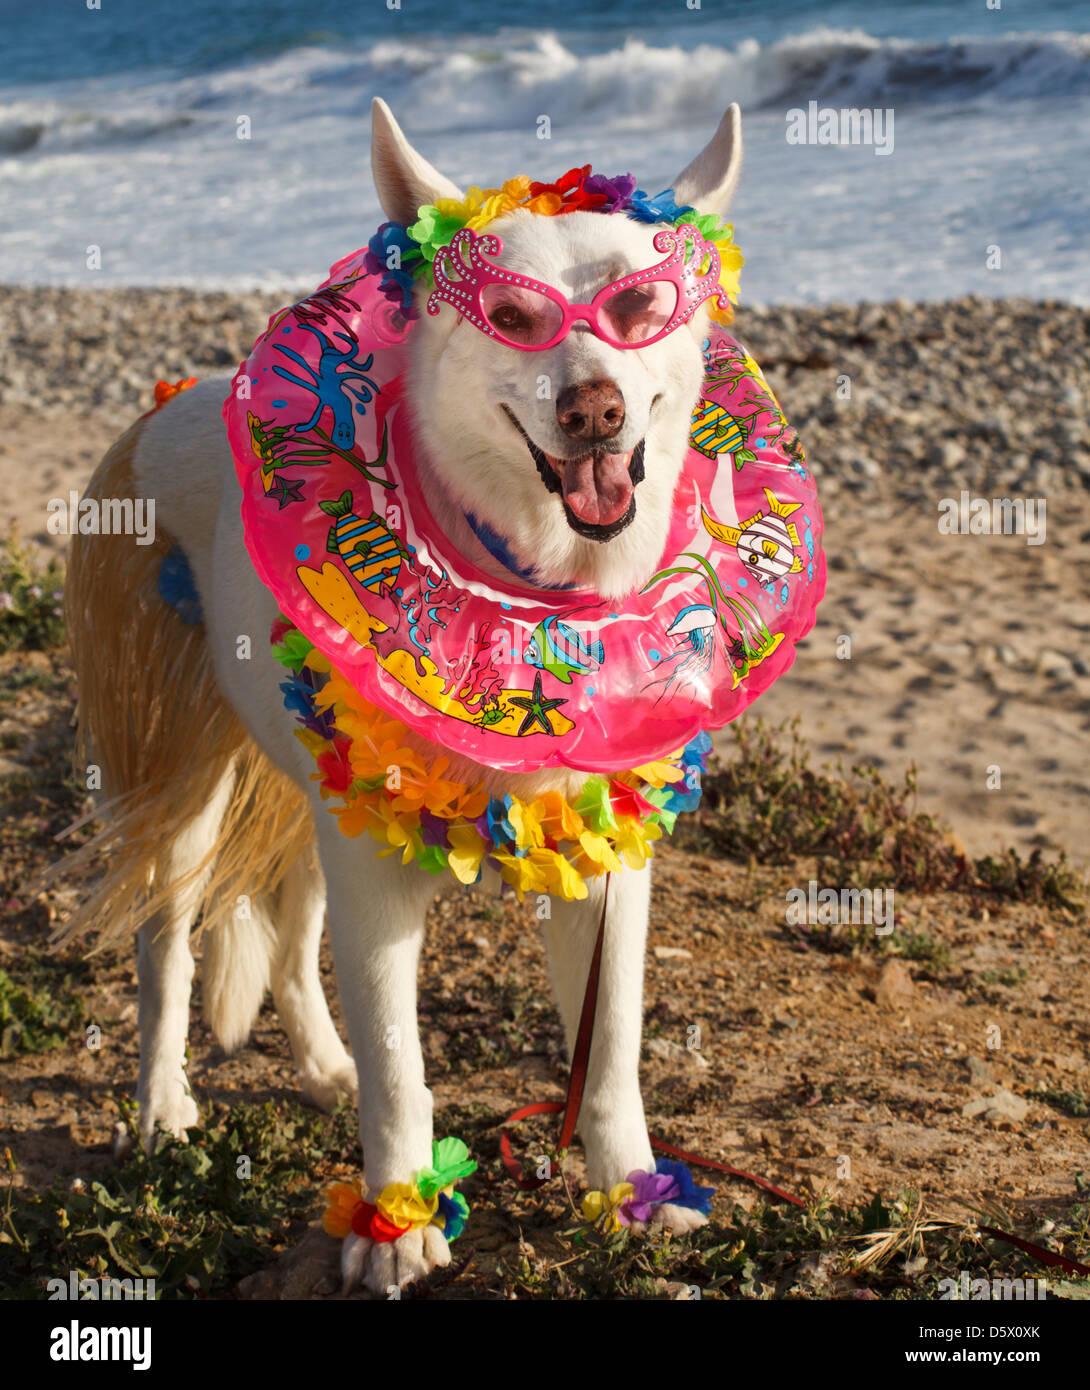 White German Shepherd wearing Hawaii-theme costume with leis, hula skirt and swim ring - Stock Image